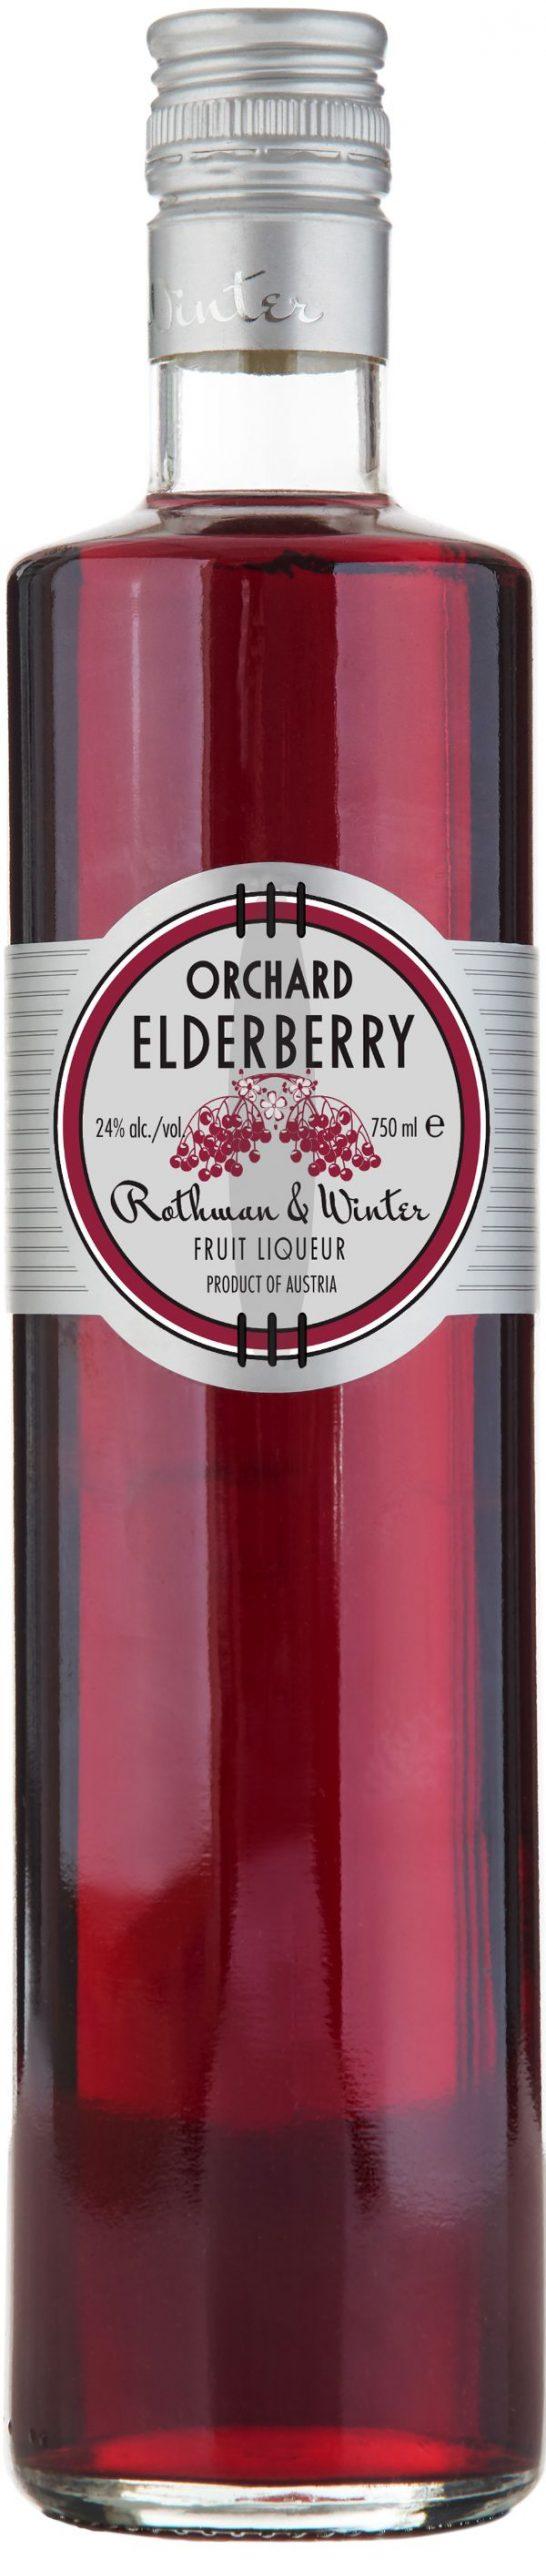 Rothman & Winter Orchard Elderberry 48 PF